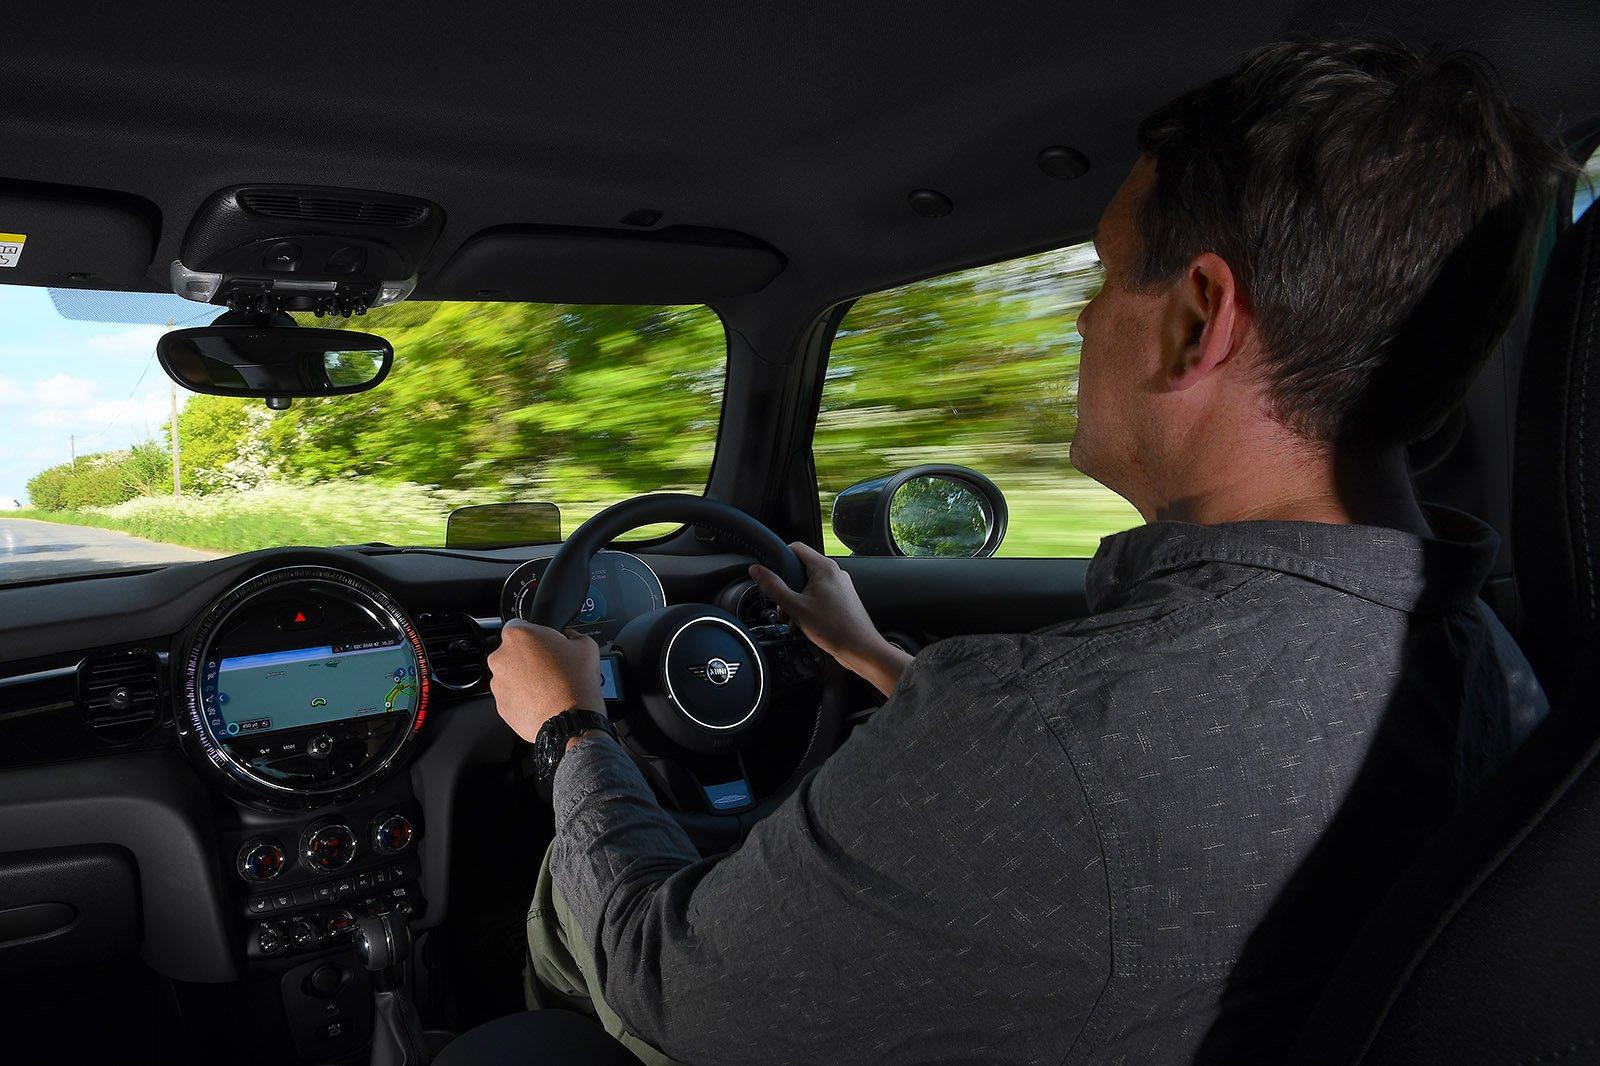 2021 Mini Hatchback 5dr Cooper Sport Haining driving